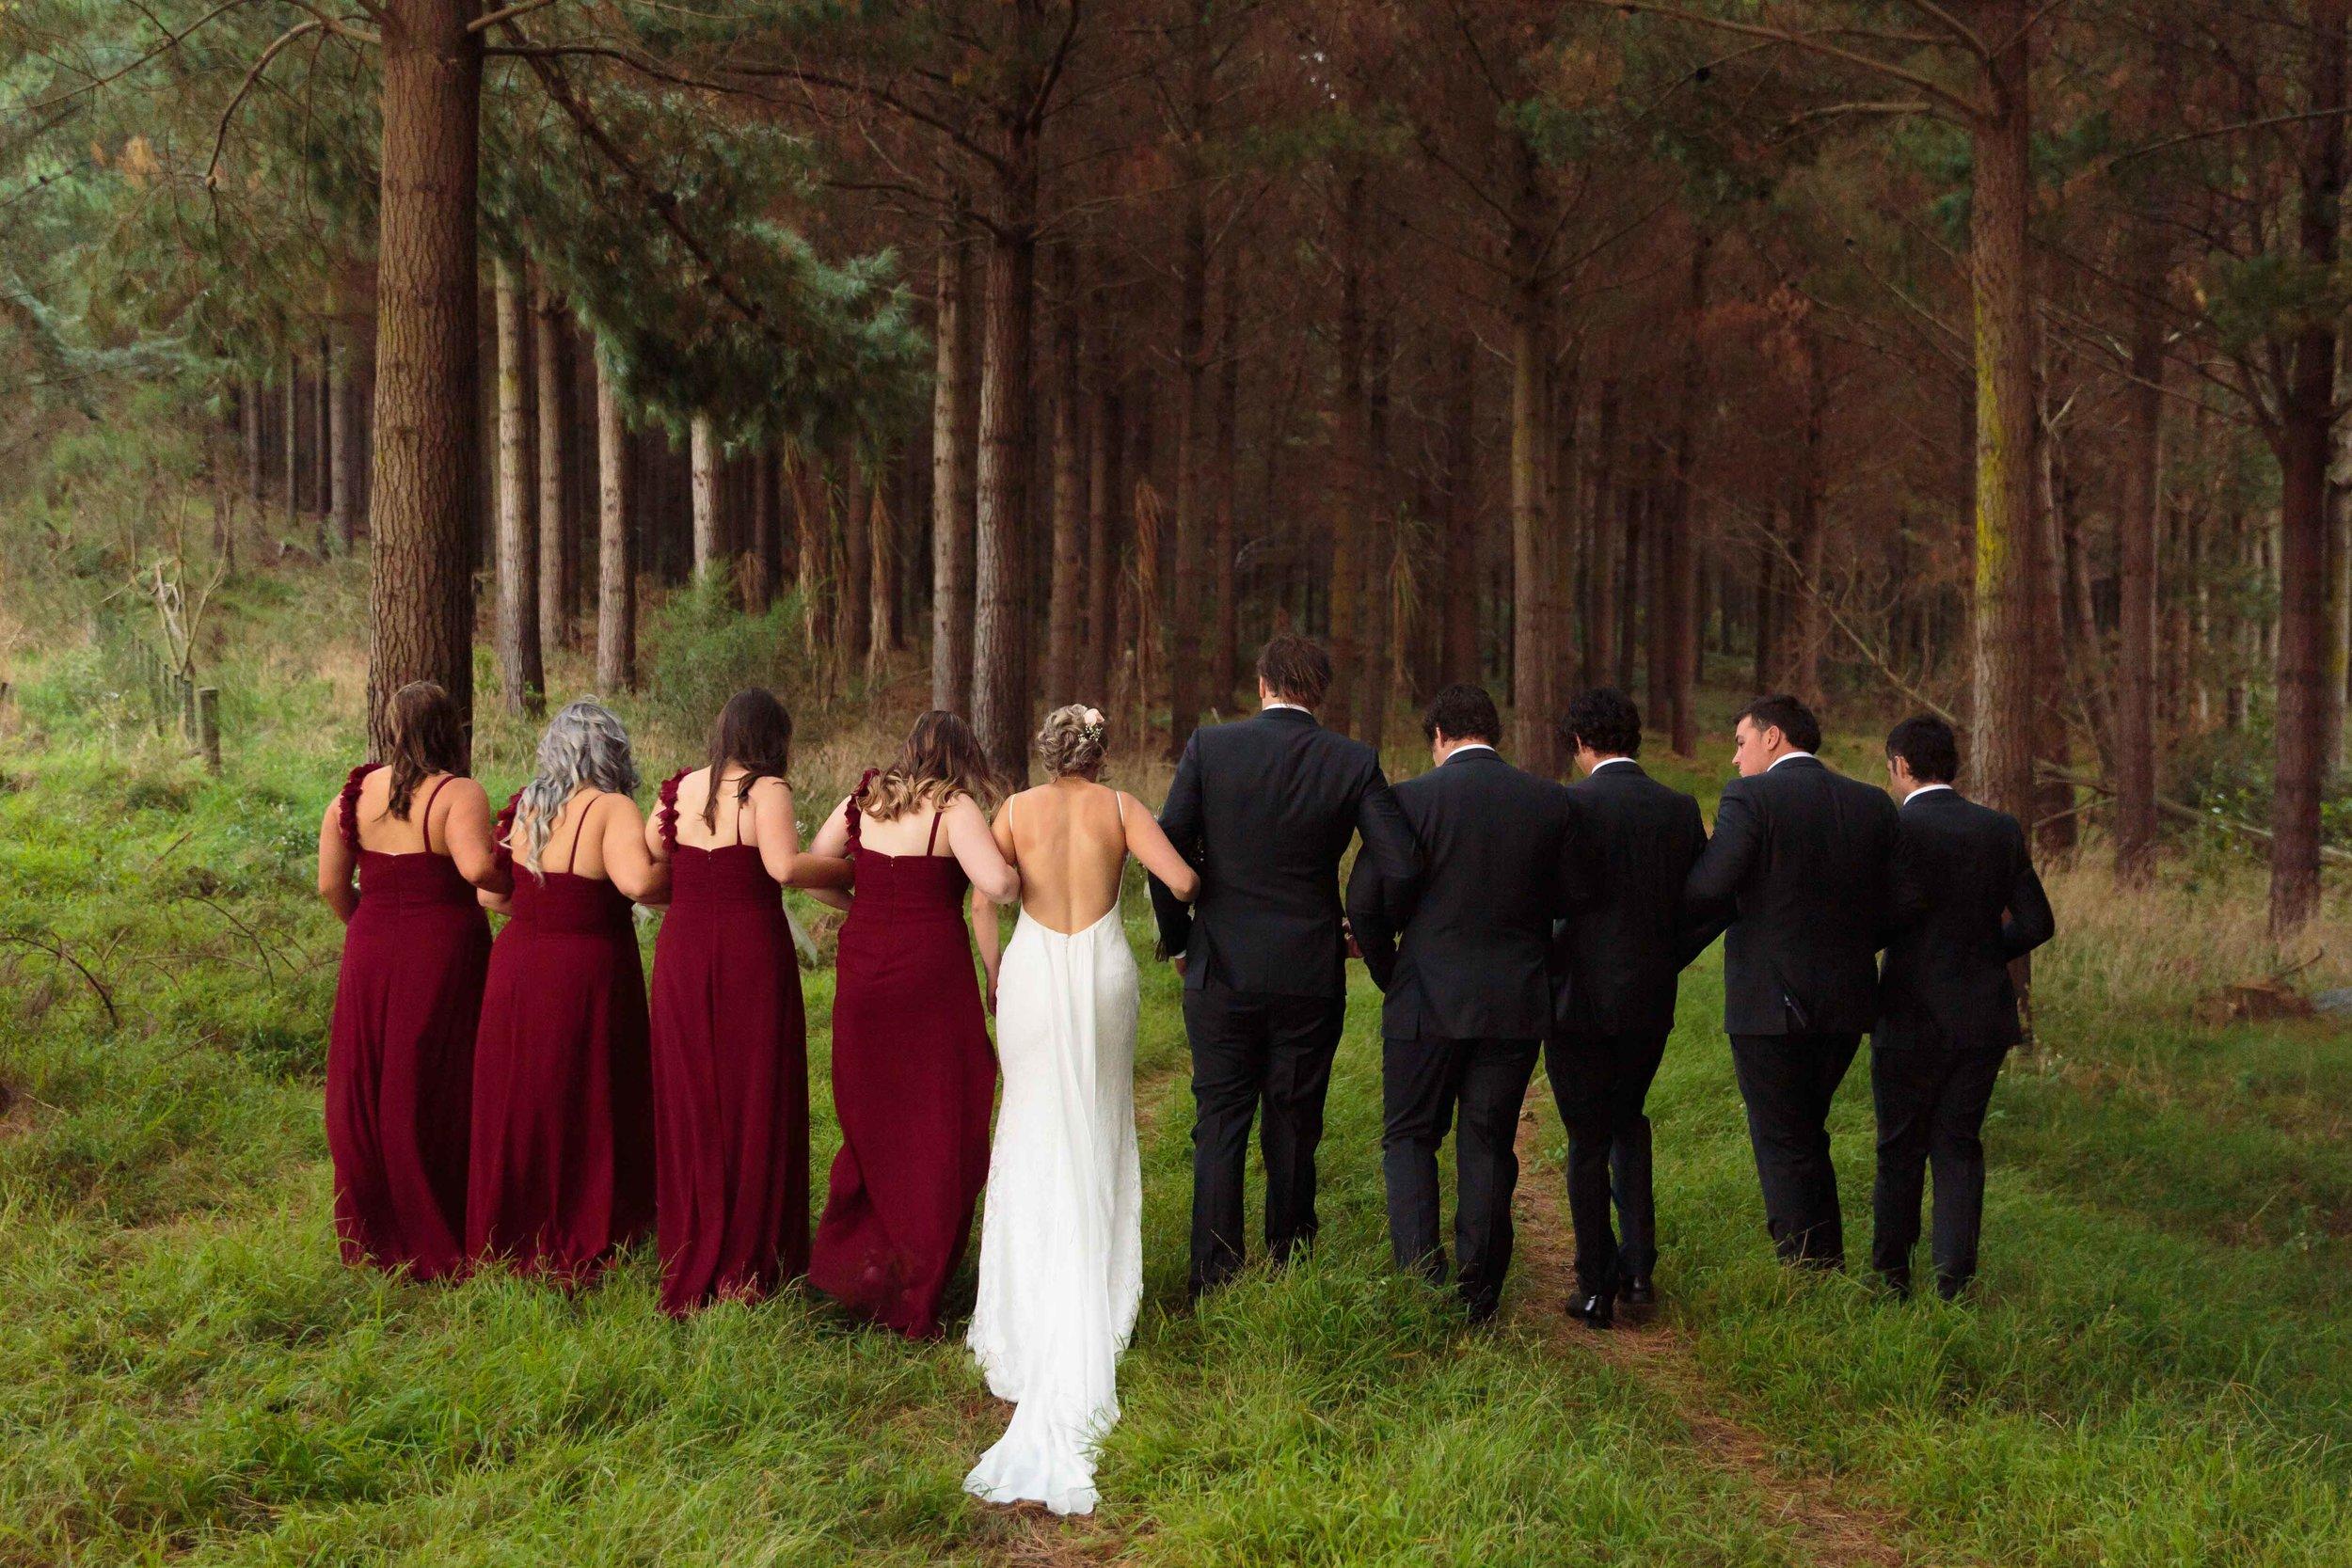 Highight-wedding-photography-dudding-lake-palmerston-north-new-zealand-66.jpg